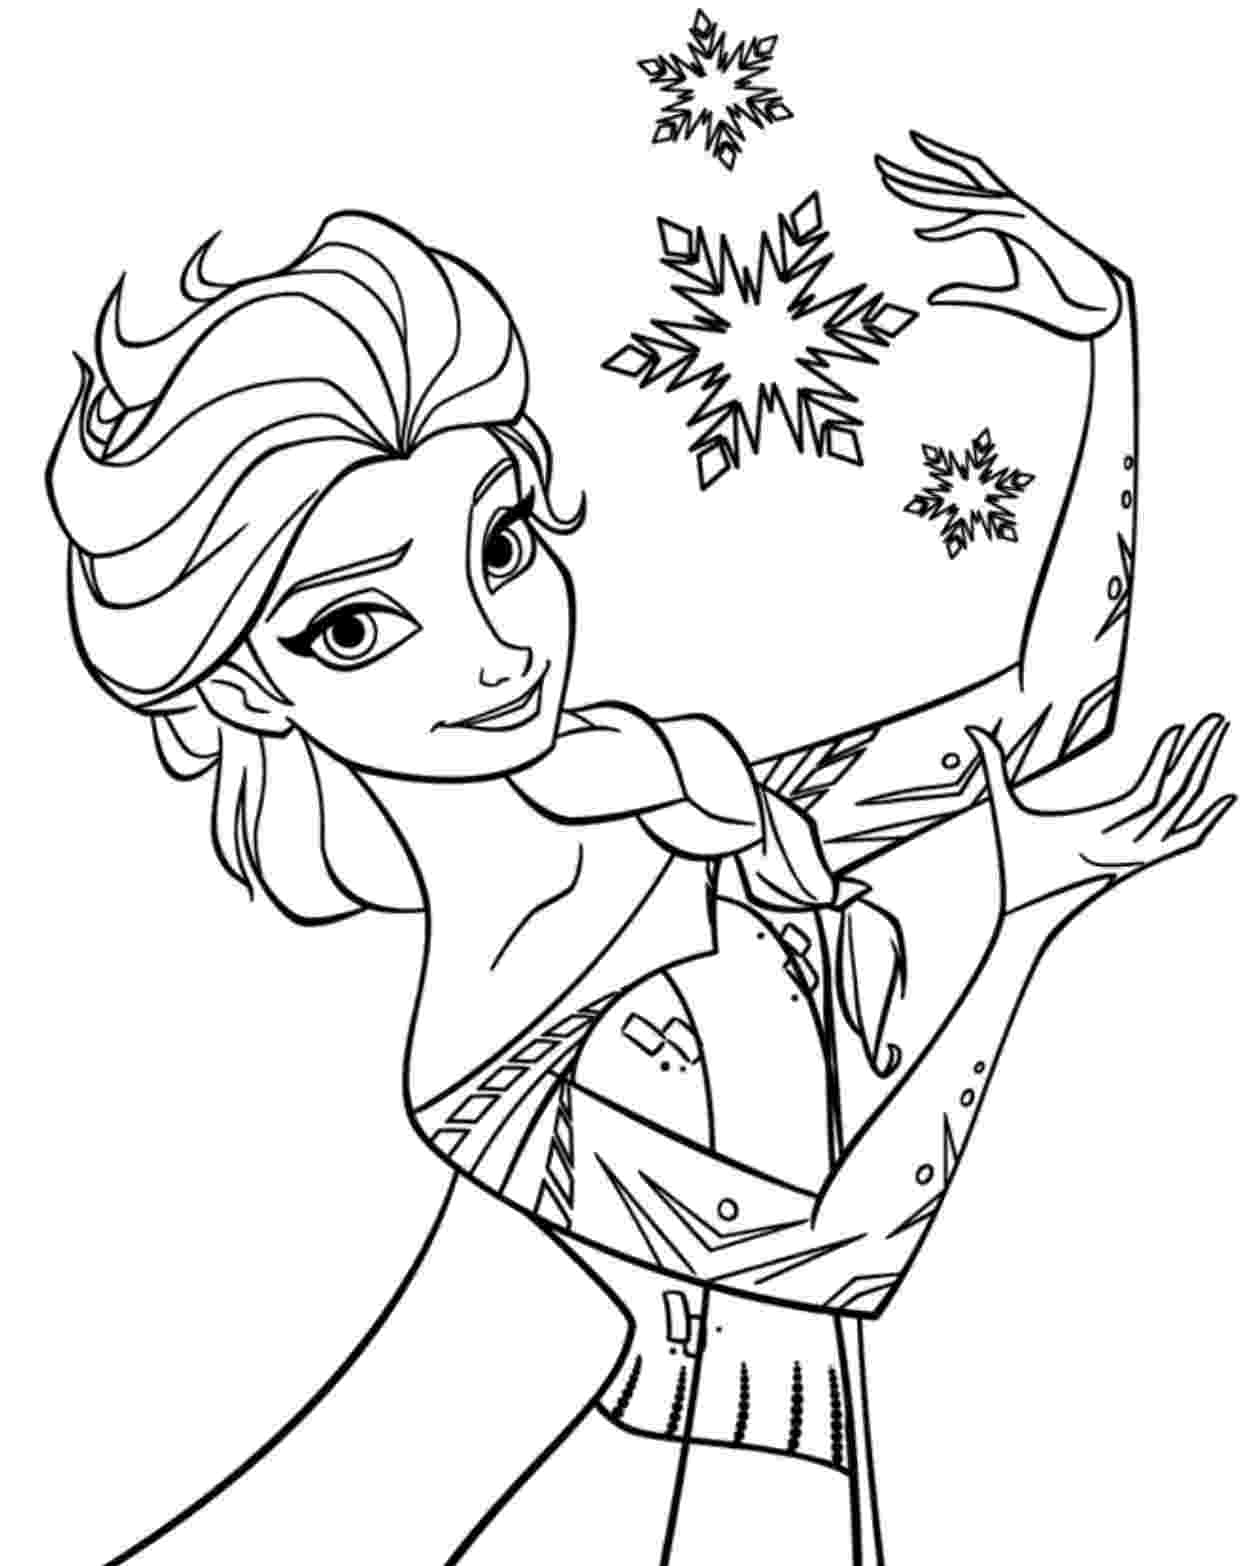 elsa coloring sheet free printable elsa coloring pages for kids best coloring sheet elsa